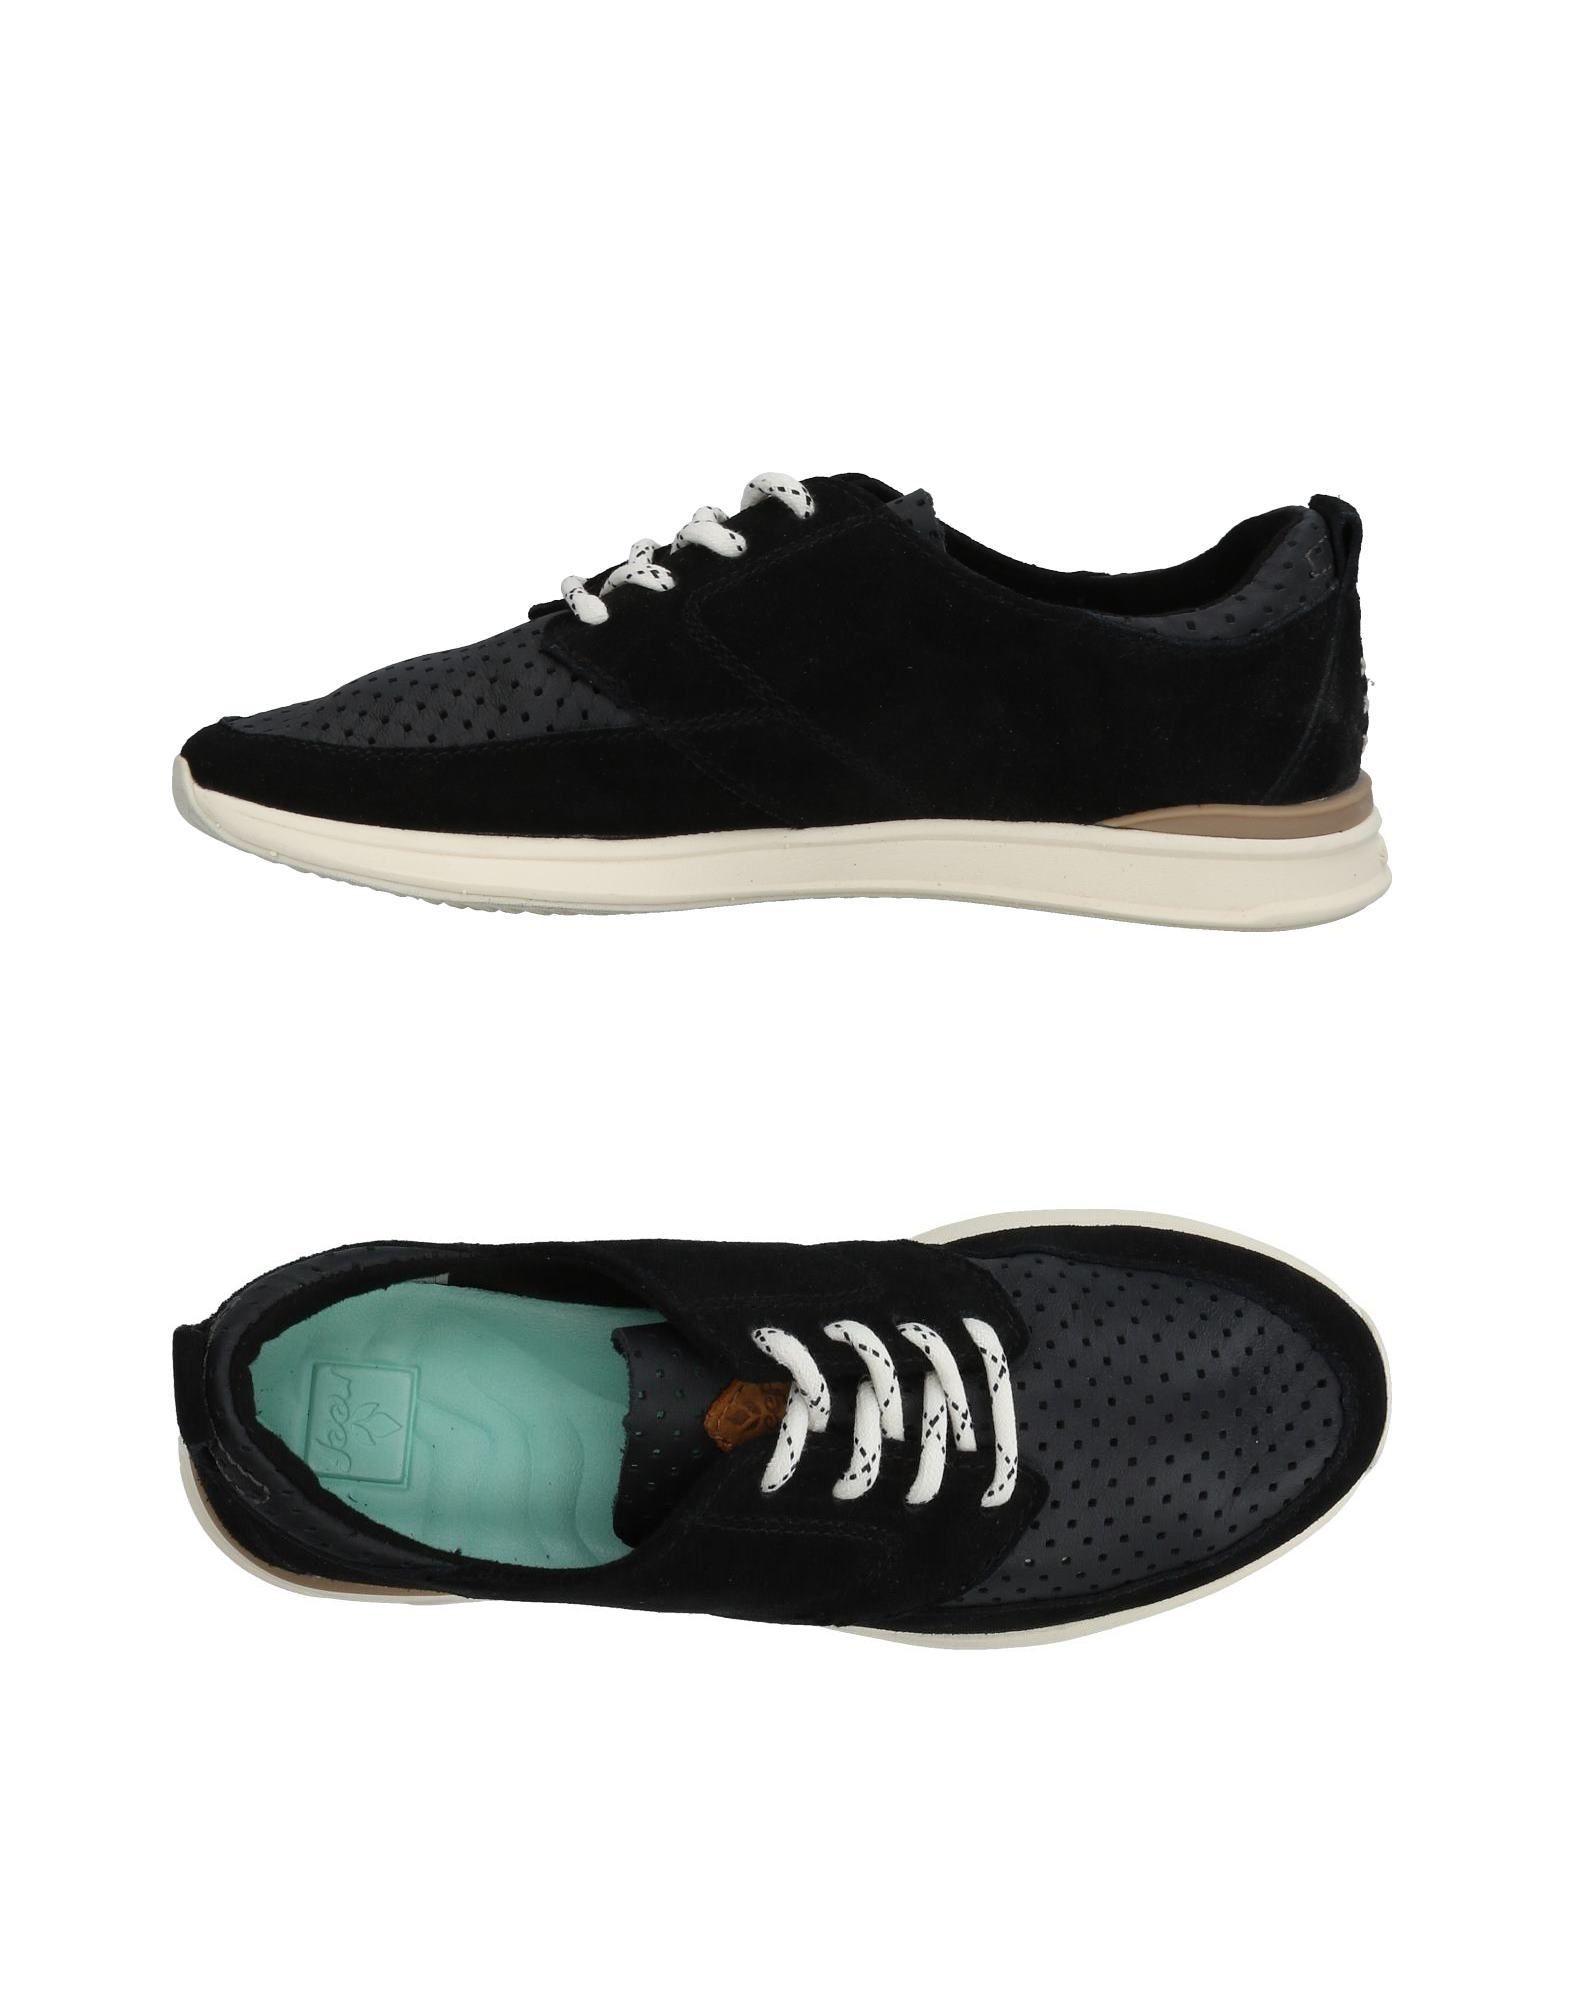 REEF Низкие кеды и кроссовки кеды кроссовки низкие reef ridge premium heathered black